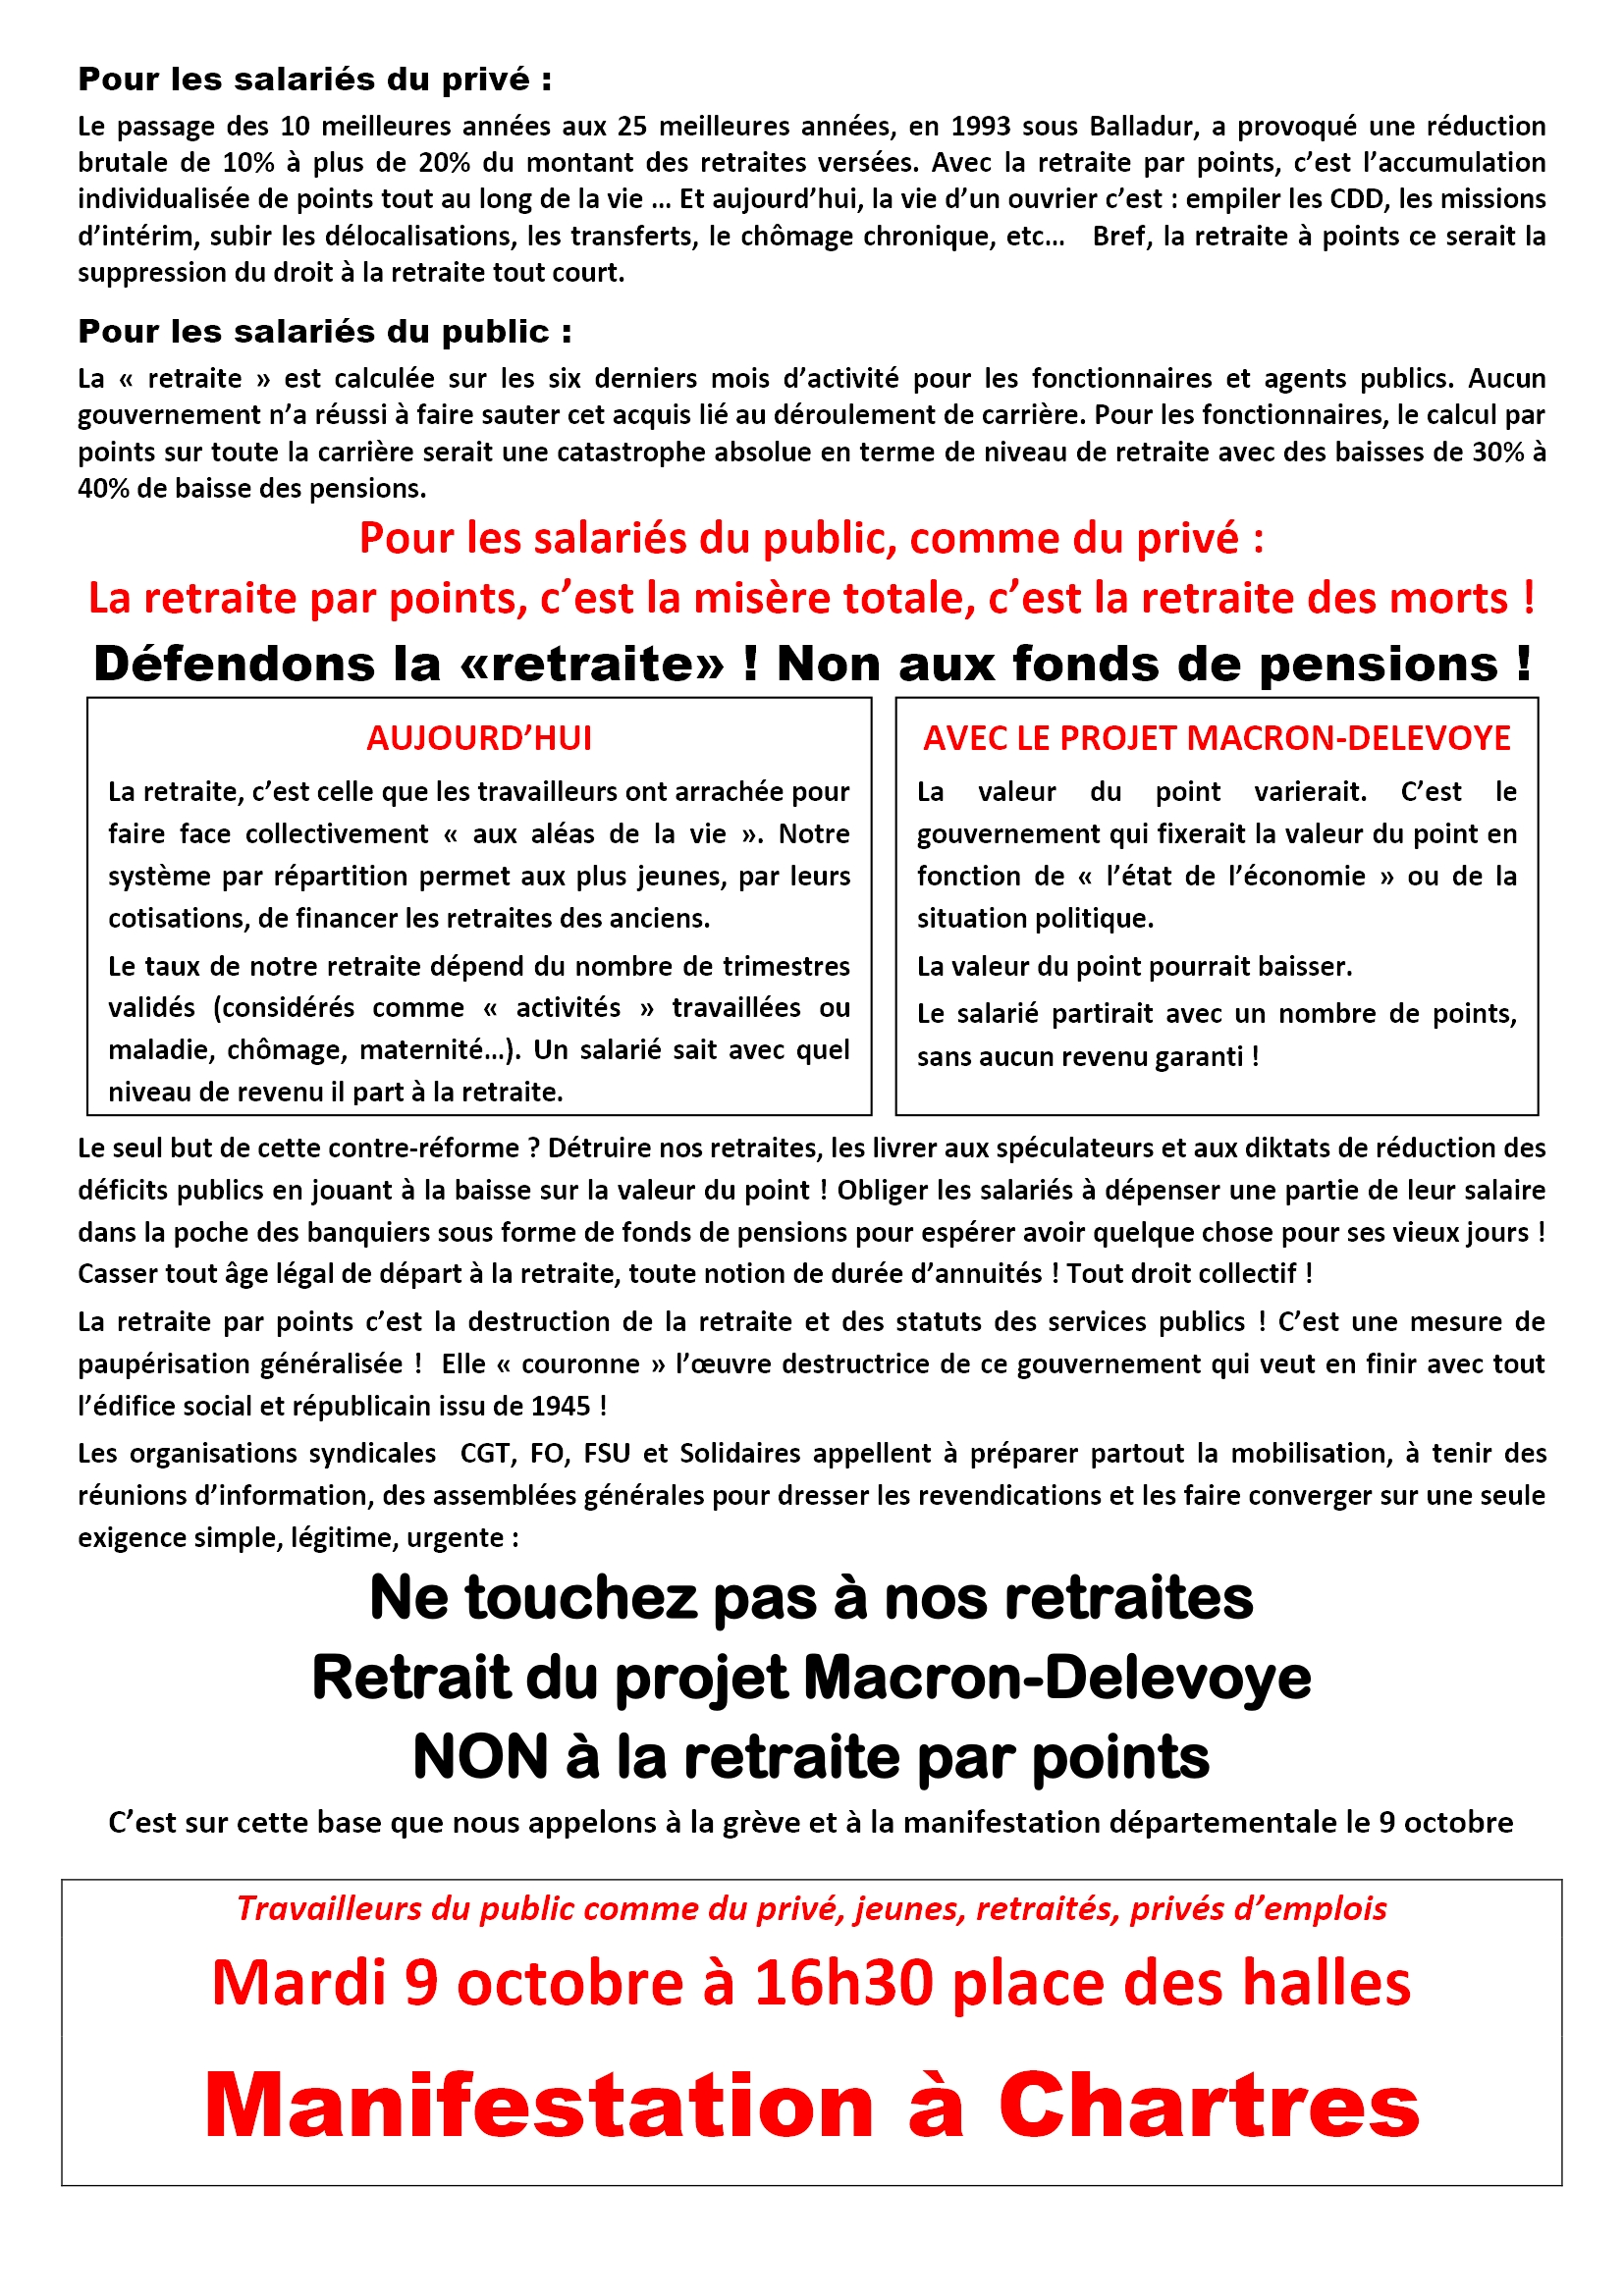 9 octobre 2018 Appel interpro Eure-et-loir Verso